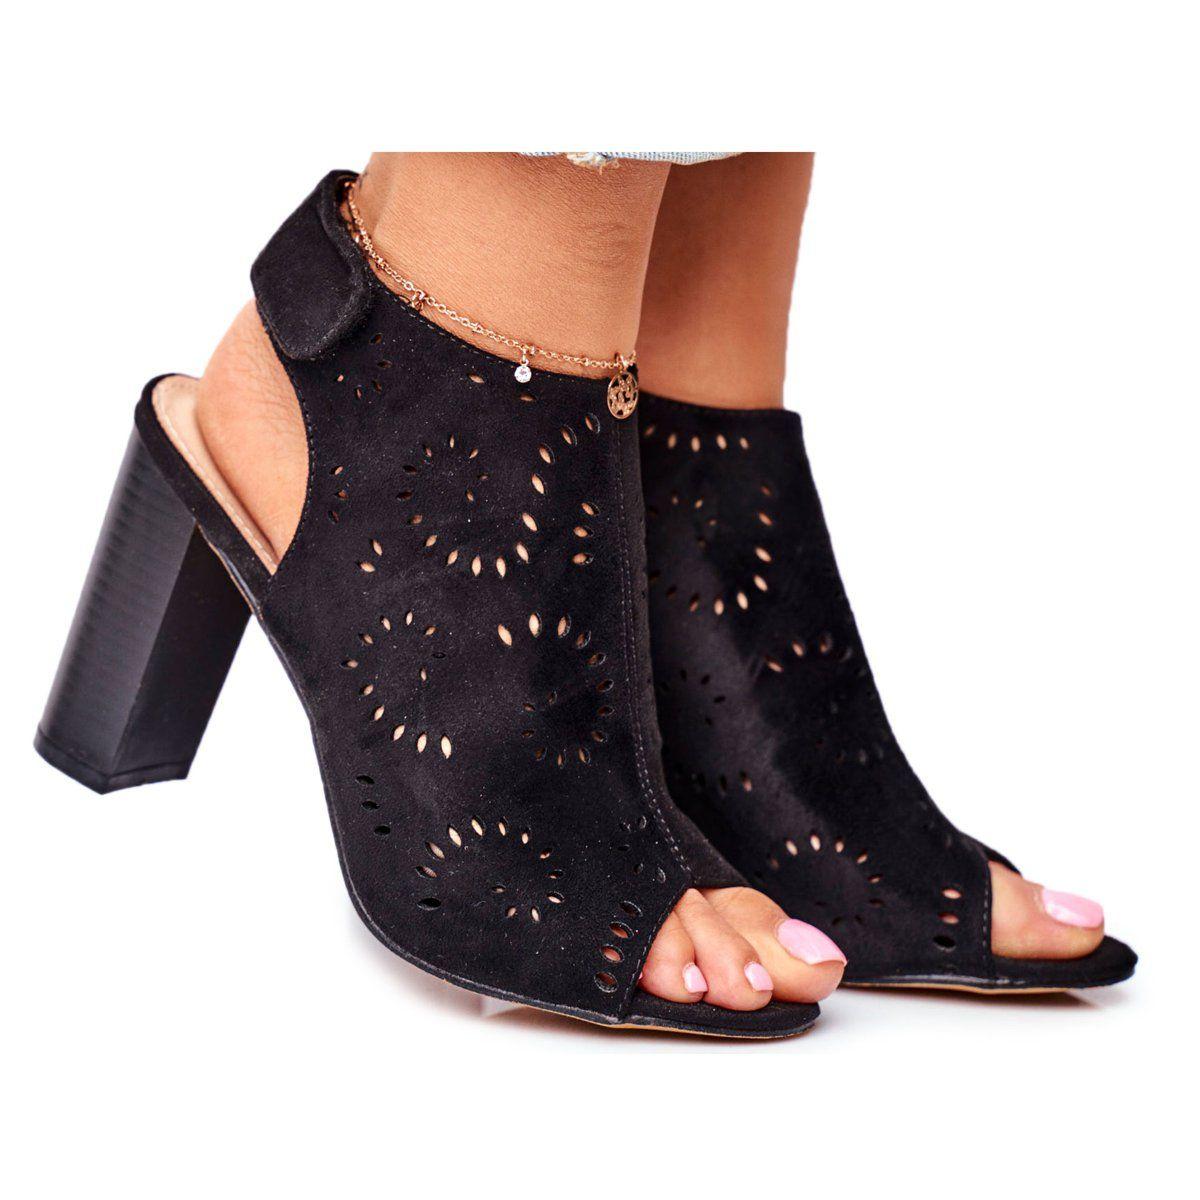 Eve Sandaly Damskie Na Slupku Azurowe Na Rzep Czarne Rules Heeled Mules Heels Shoes